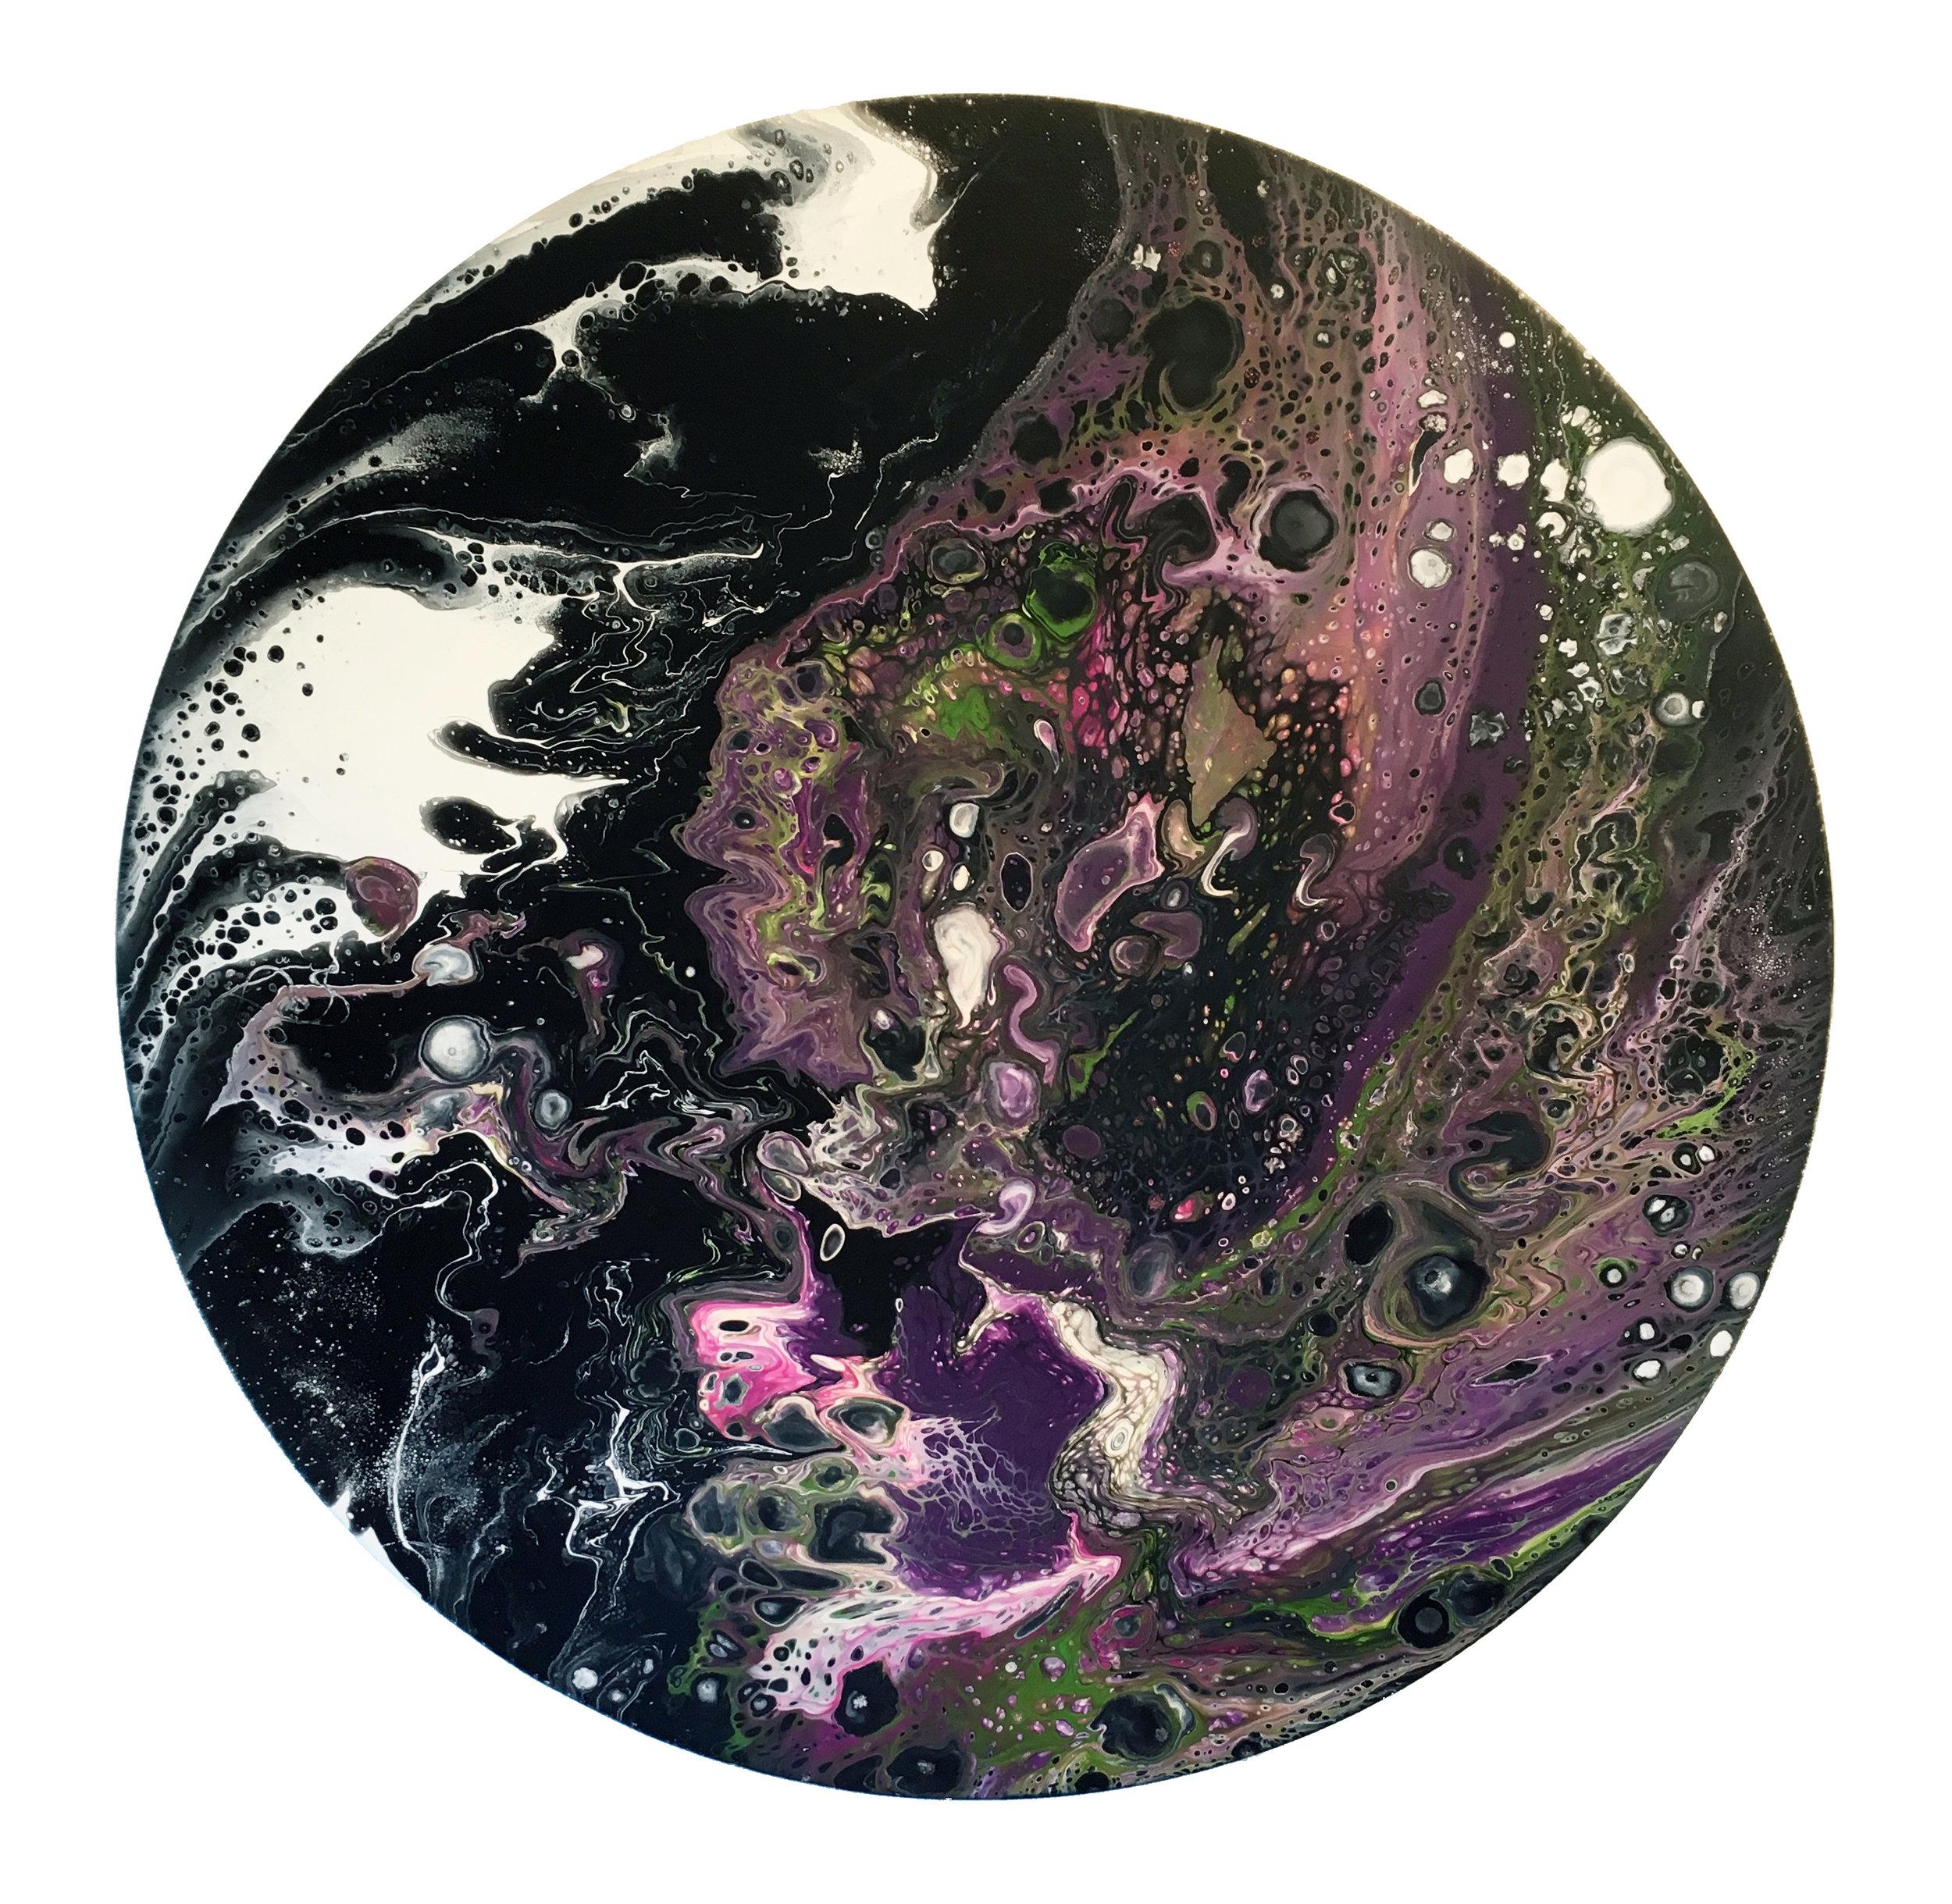 'Asteroid'